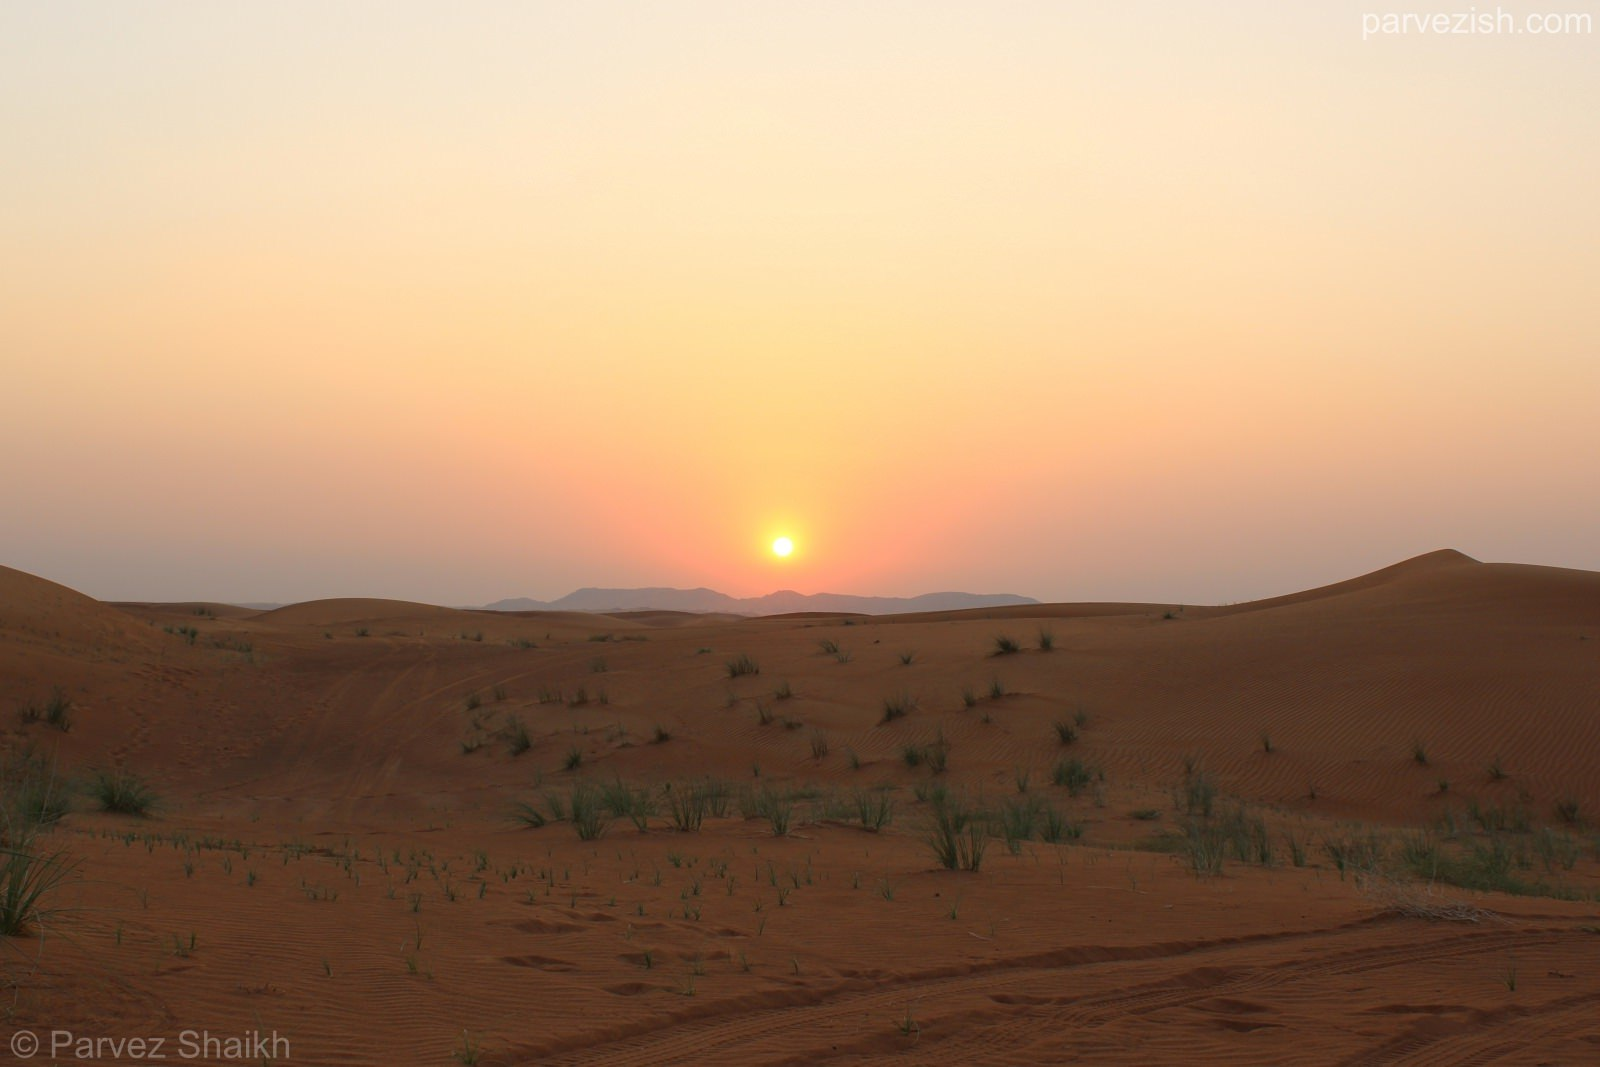 Sunset as seen from Dubai Desert